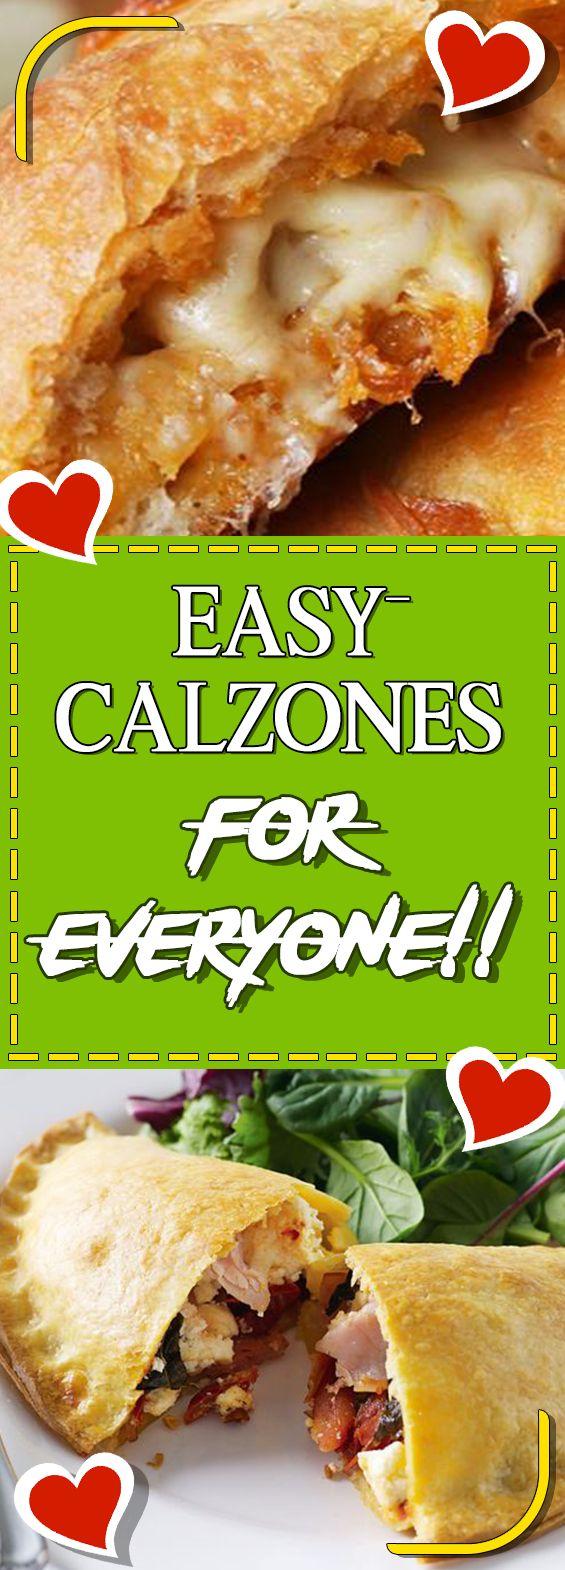 EASY CALZONES FOR EVERYONE!! Via #yummymommiesnet #vegetarian vegetarian #vegetarianrecipes vegetarian recipes #recipeoftheday recipe of the day #recipe recipe #vegan vegan recipes #veganfood vegan food recipes